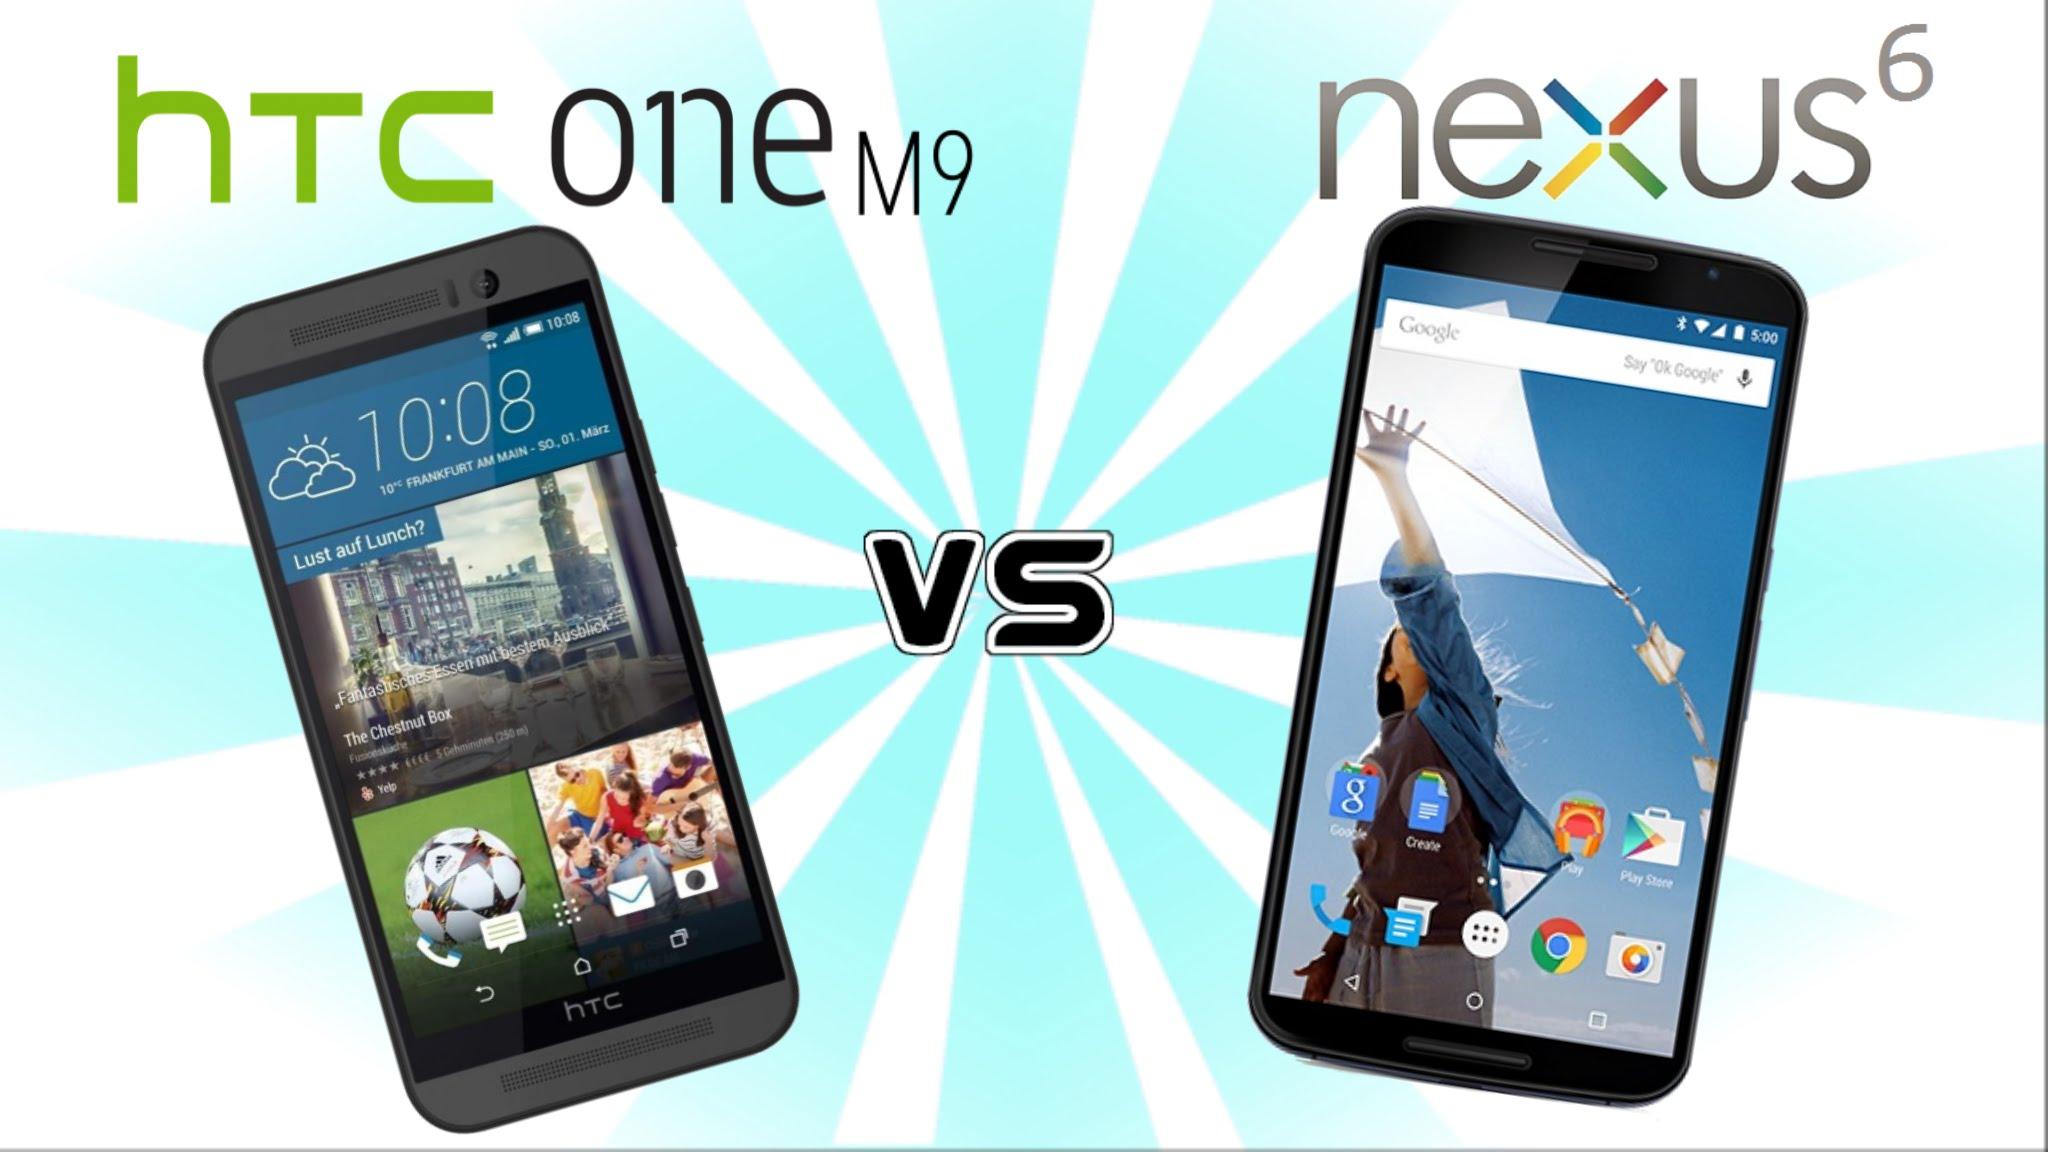 htc one m9 vs nexus 6